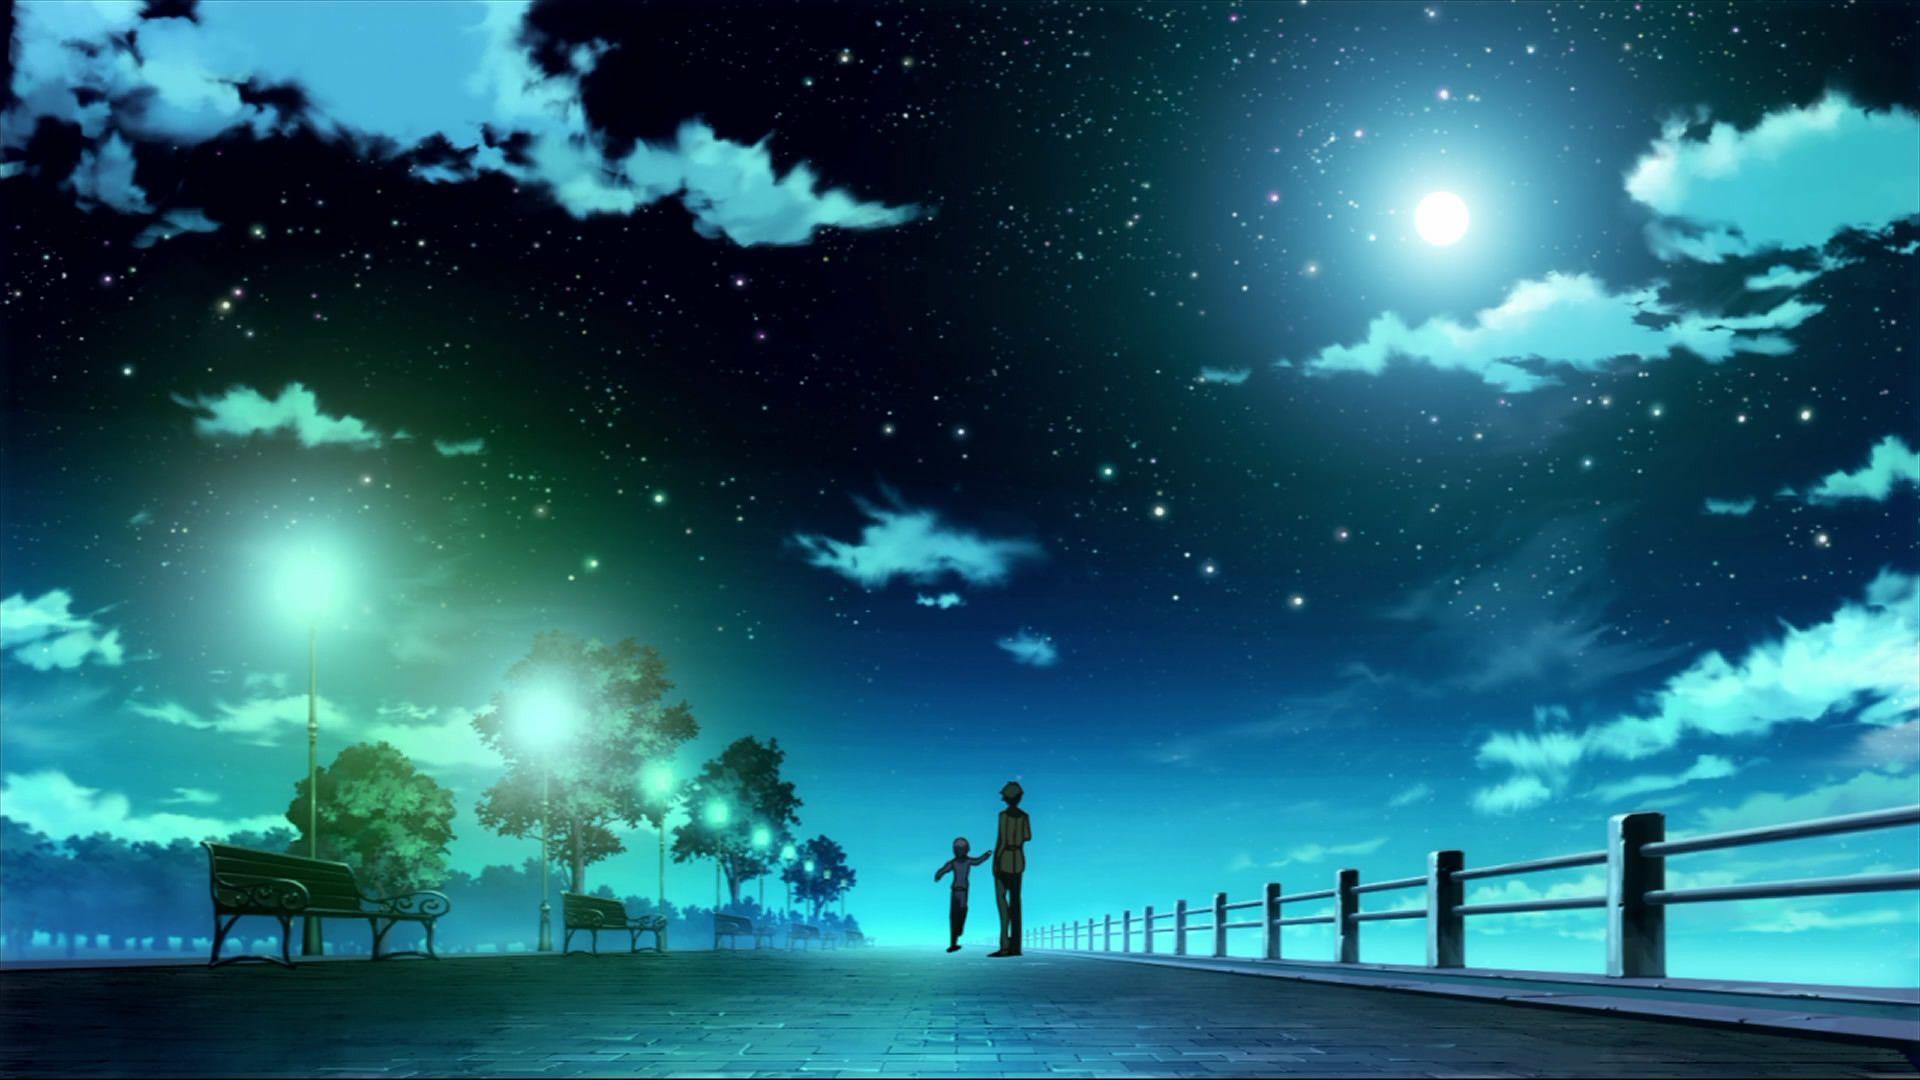 1920x1080 Justpict Com Anime Night Sky Wallpaper Night Sky Wallpaper Anime Scenery Wallpaper Anime Wallpaper 1920x1080